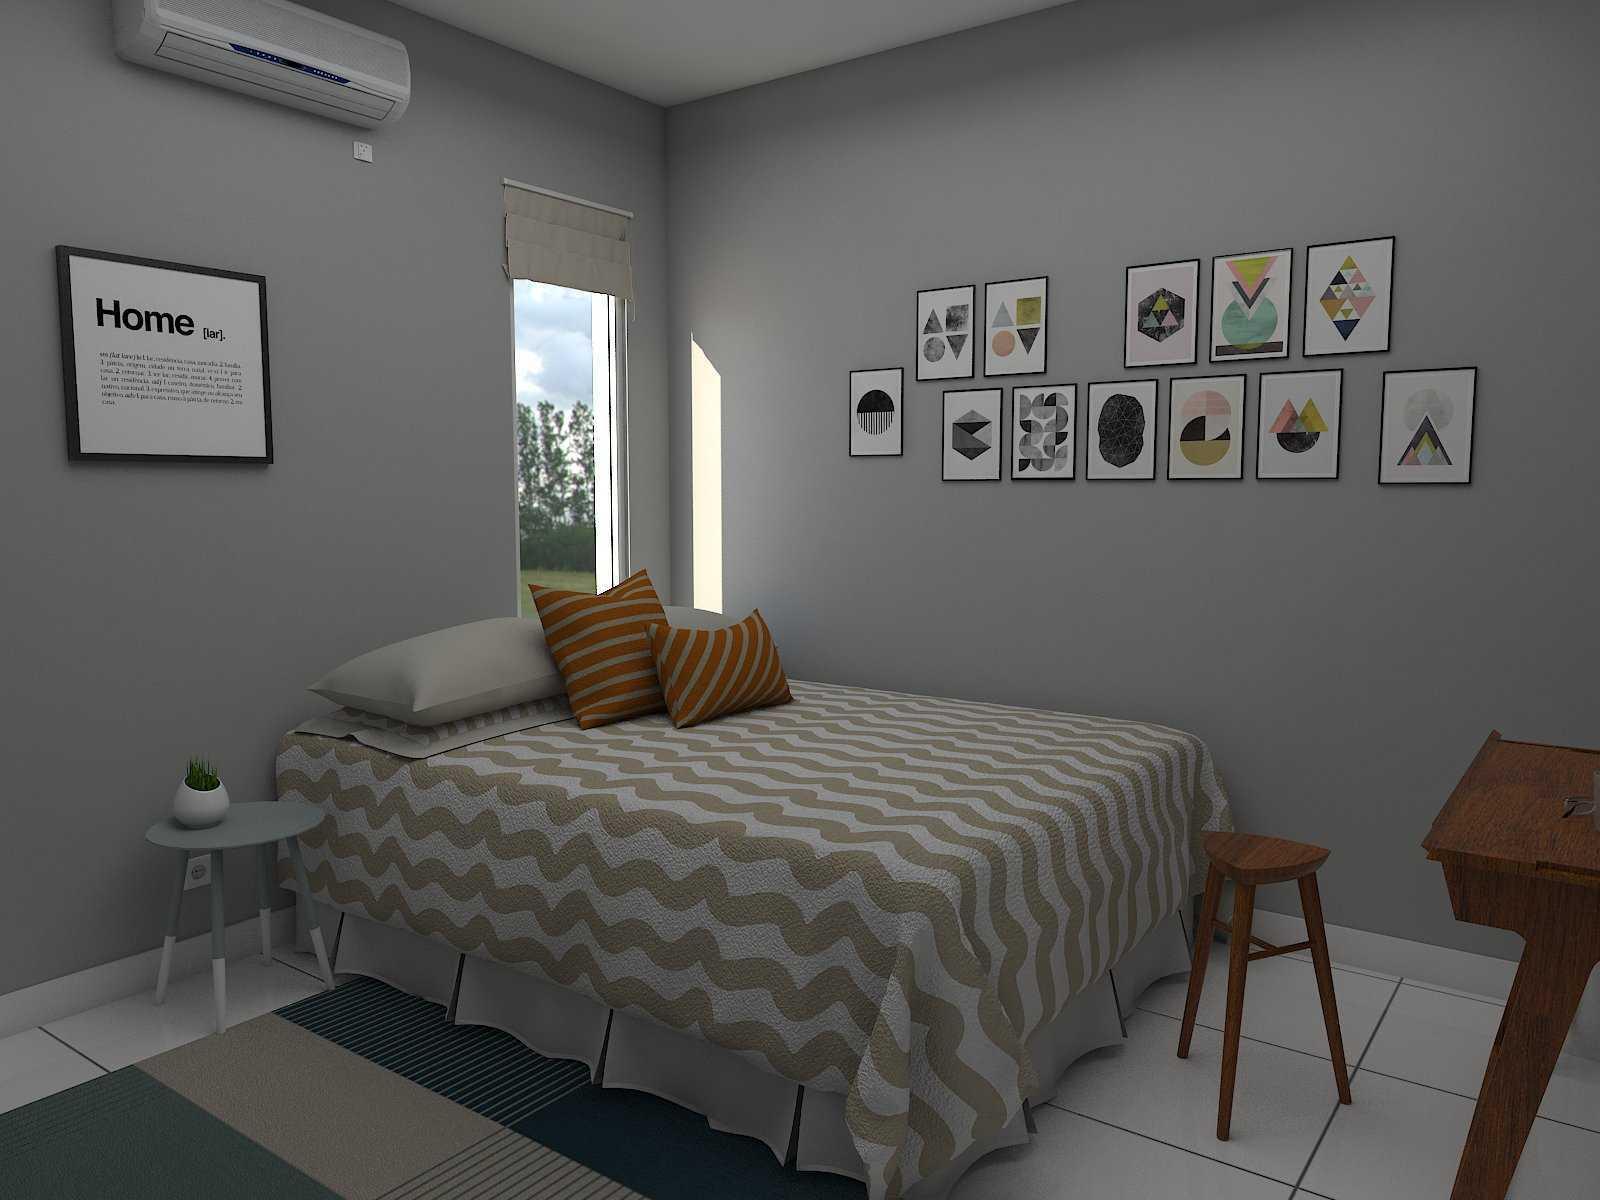 Donnie Marcellino Mr.f's House  Gg. Buntu 2, Jatimelati, Pondokmelati, Kota Bks, Jawa Barat 17415, Indonesia Guest Bedroom Design Kontemporer  30167